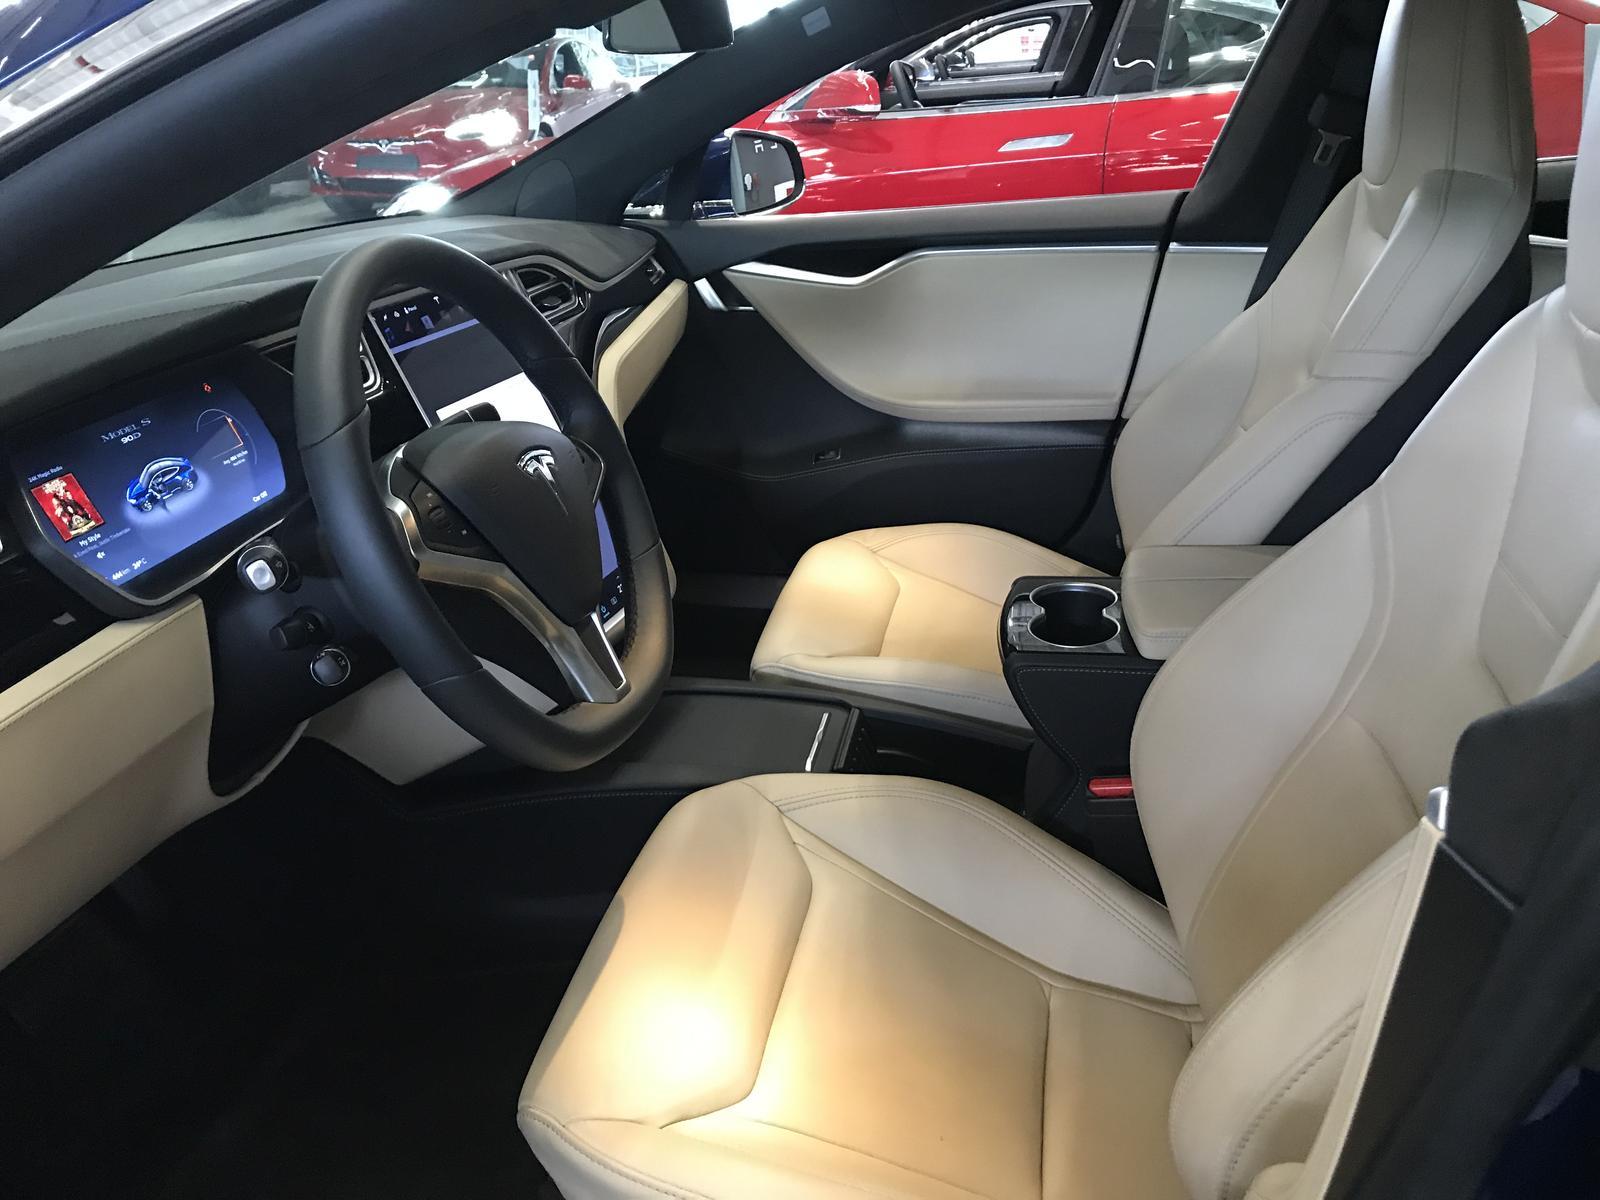 svadobnatesla - Tesla S